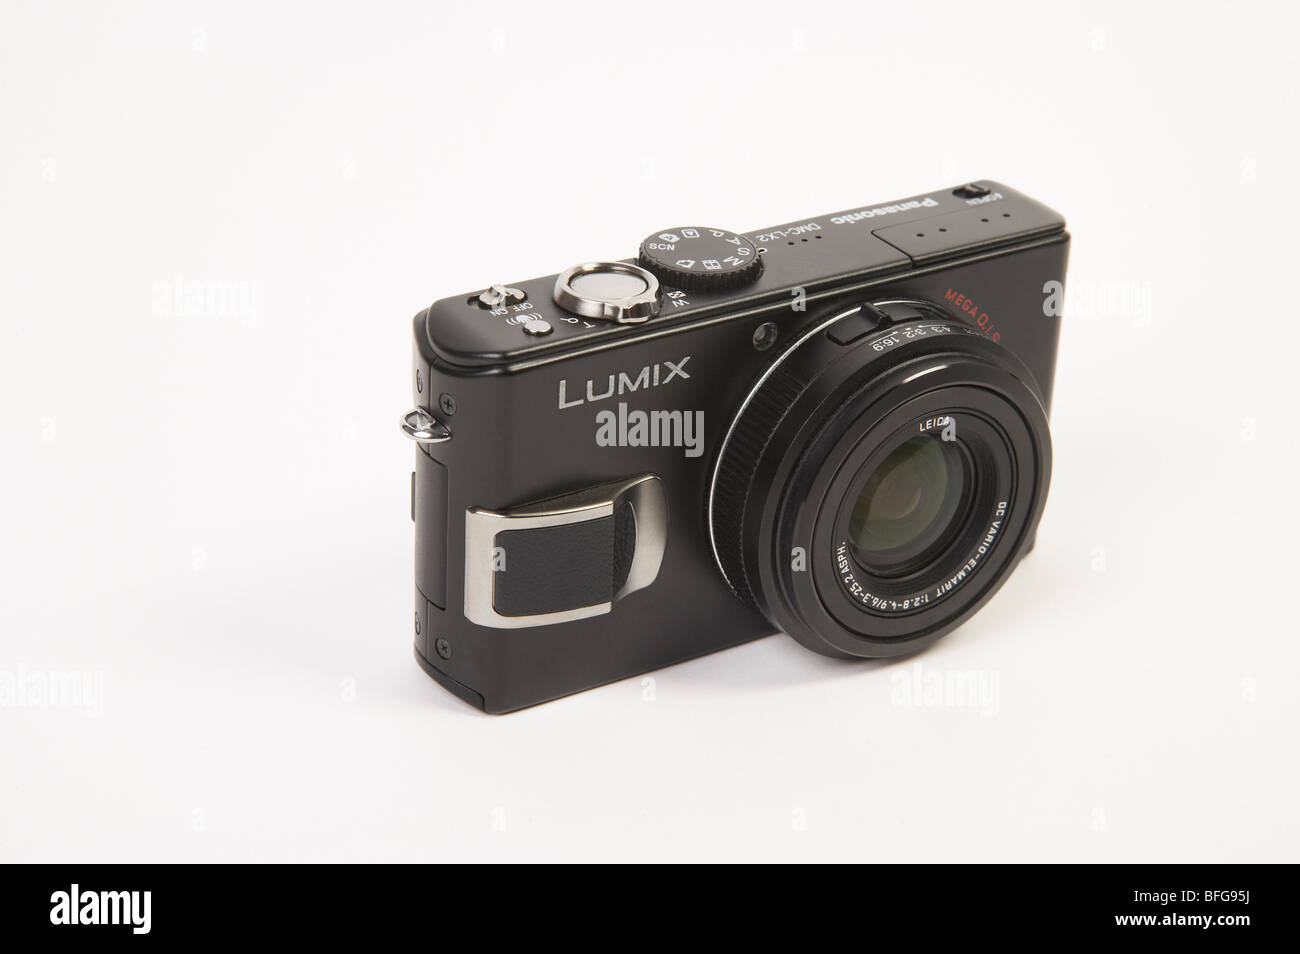 Panasonic Lumix DMC-LX2 digital camera - Stock Image